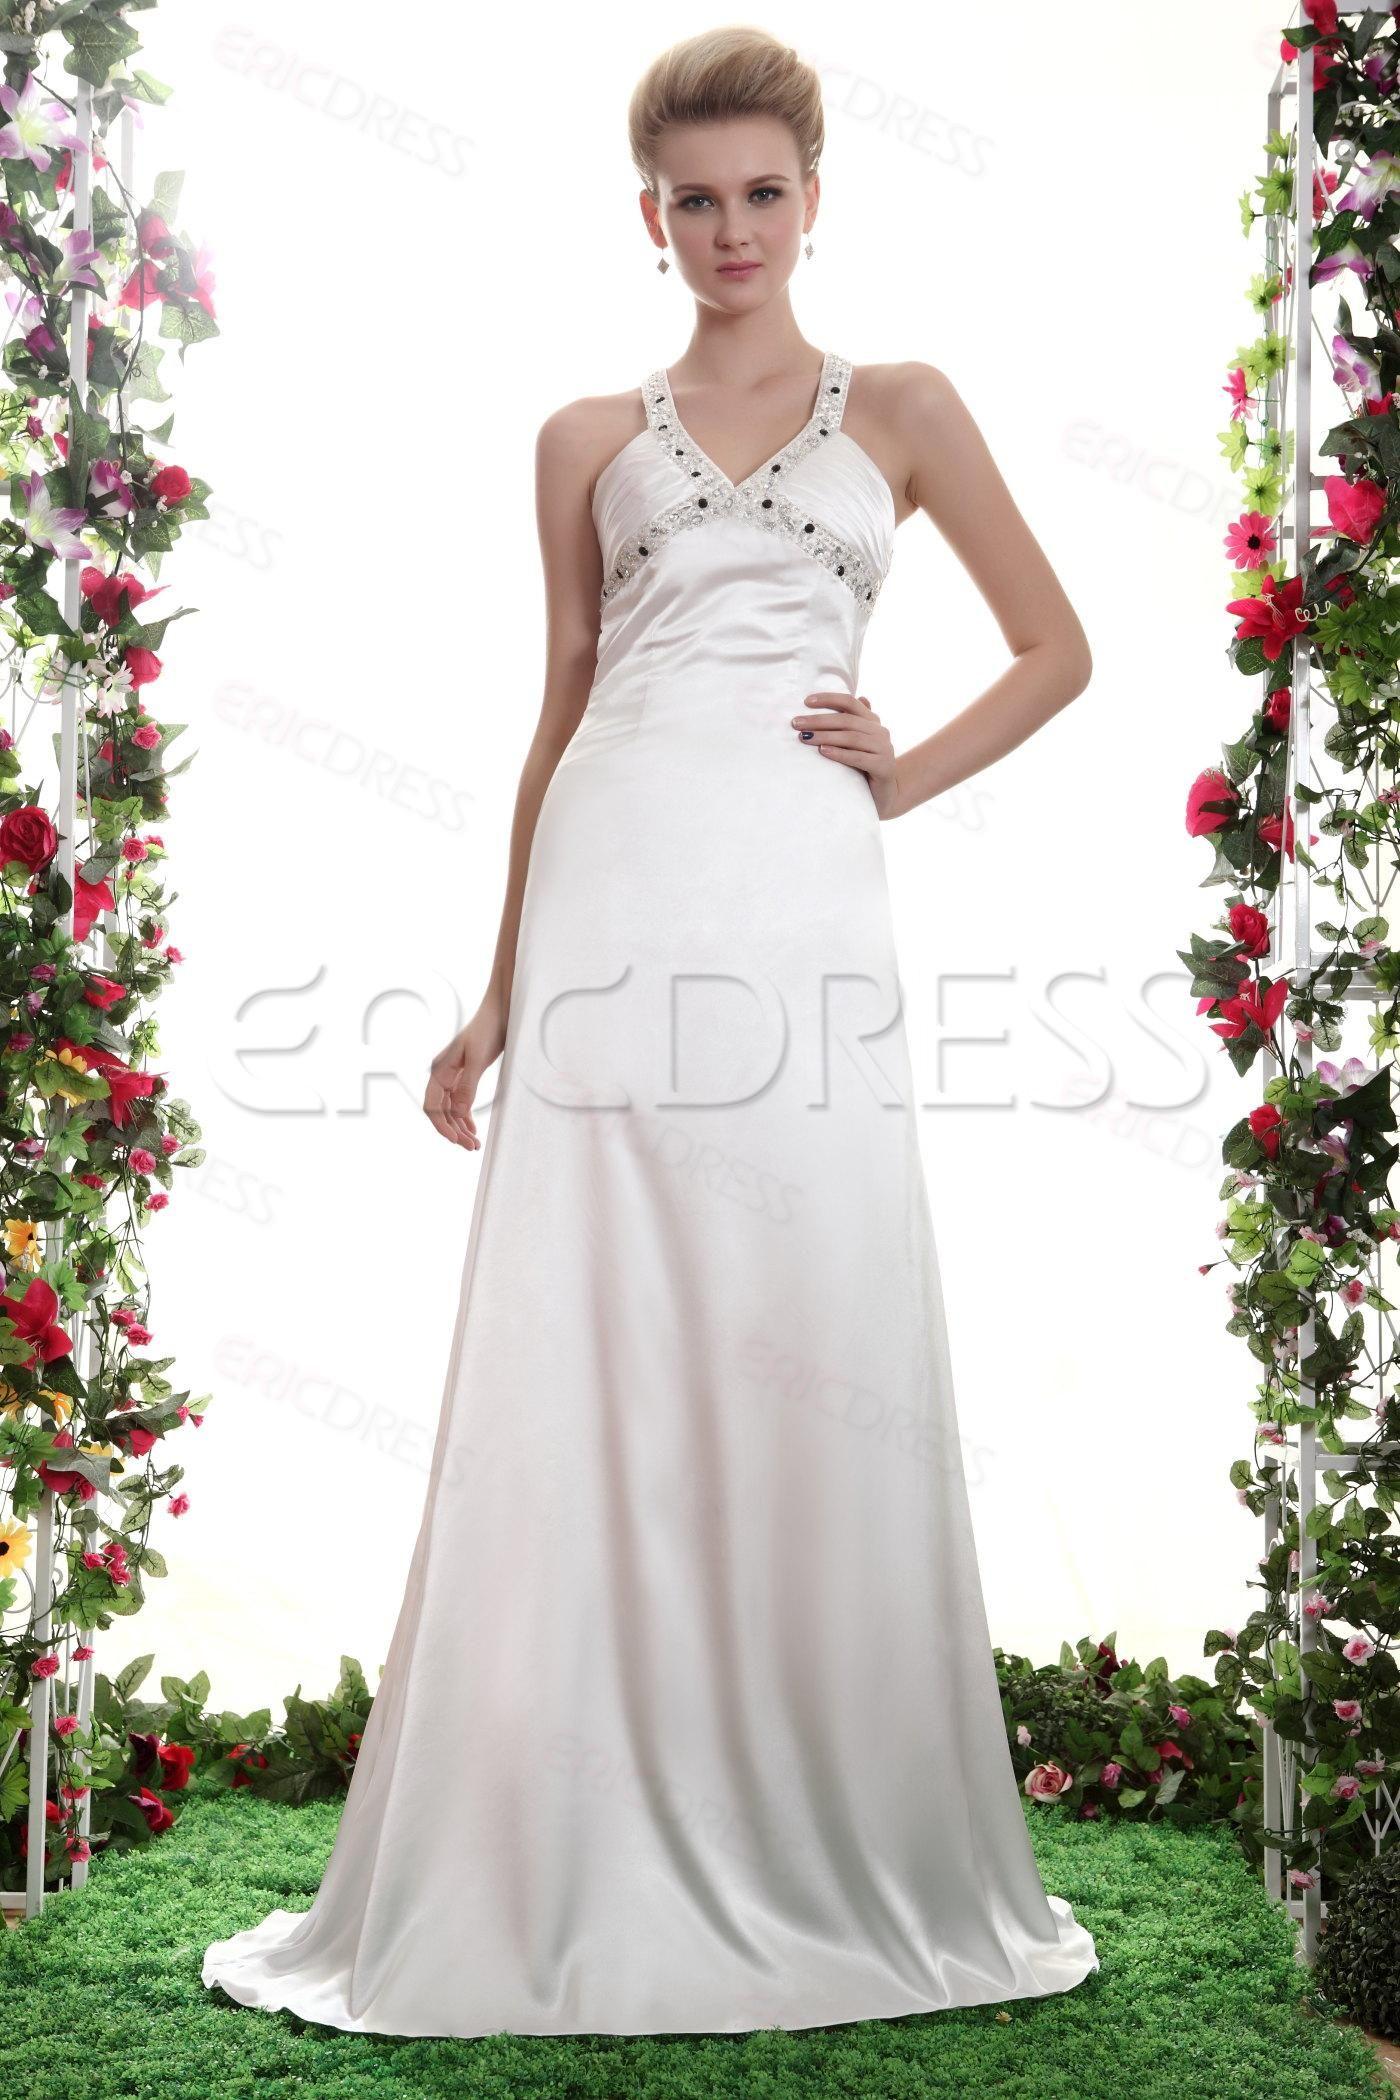 Halter top wedding dresses plus size  ColumnTrainSheath Halter top Sweeping Train Satin Yanaus Bridesmaid